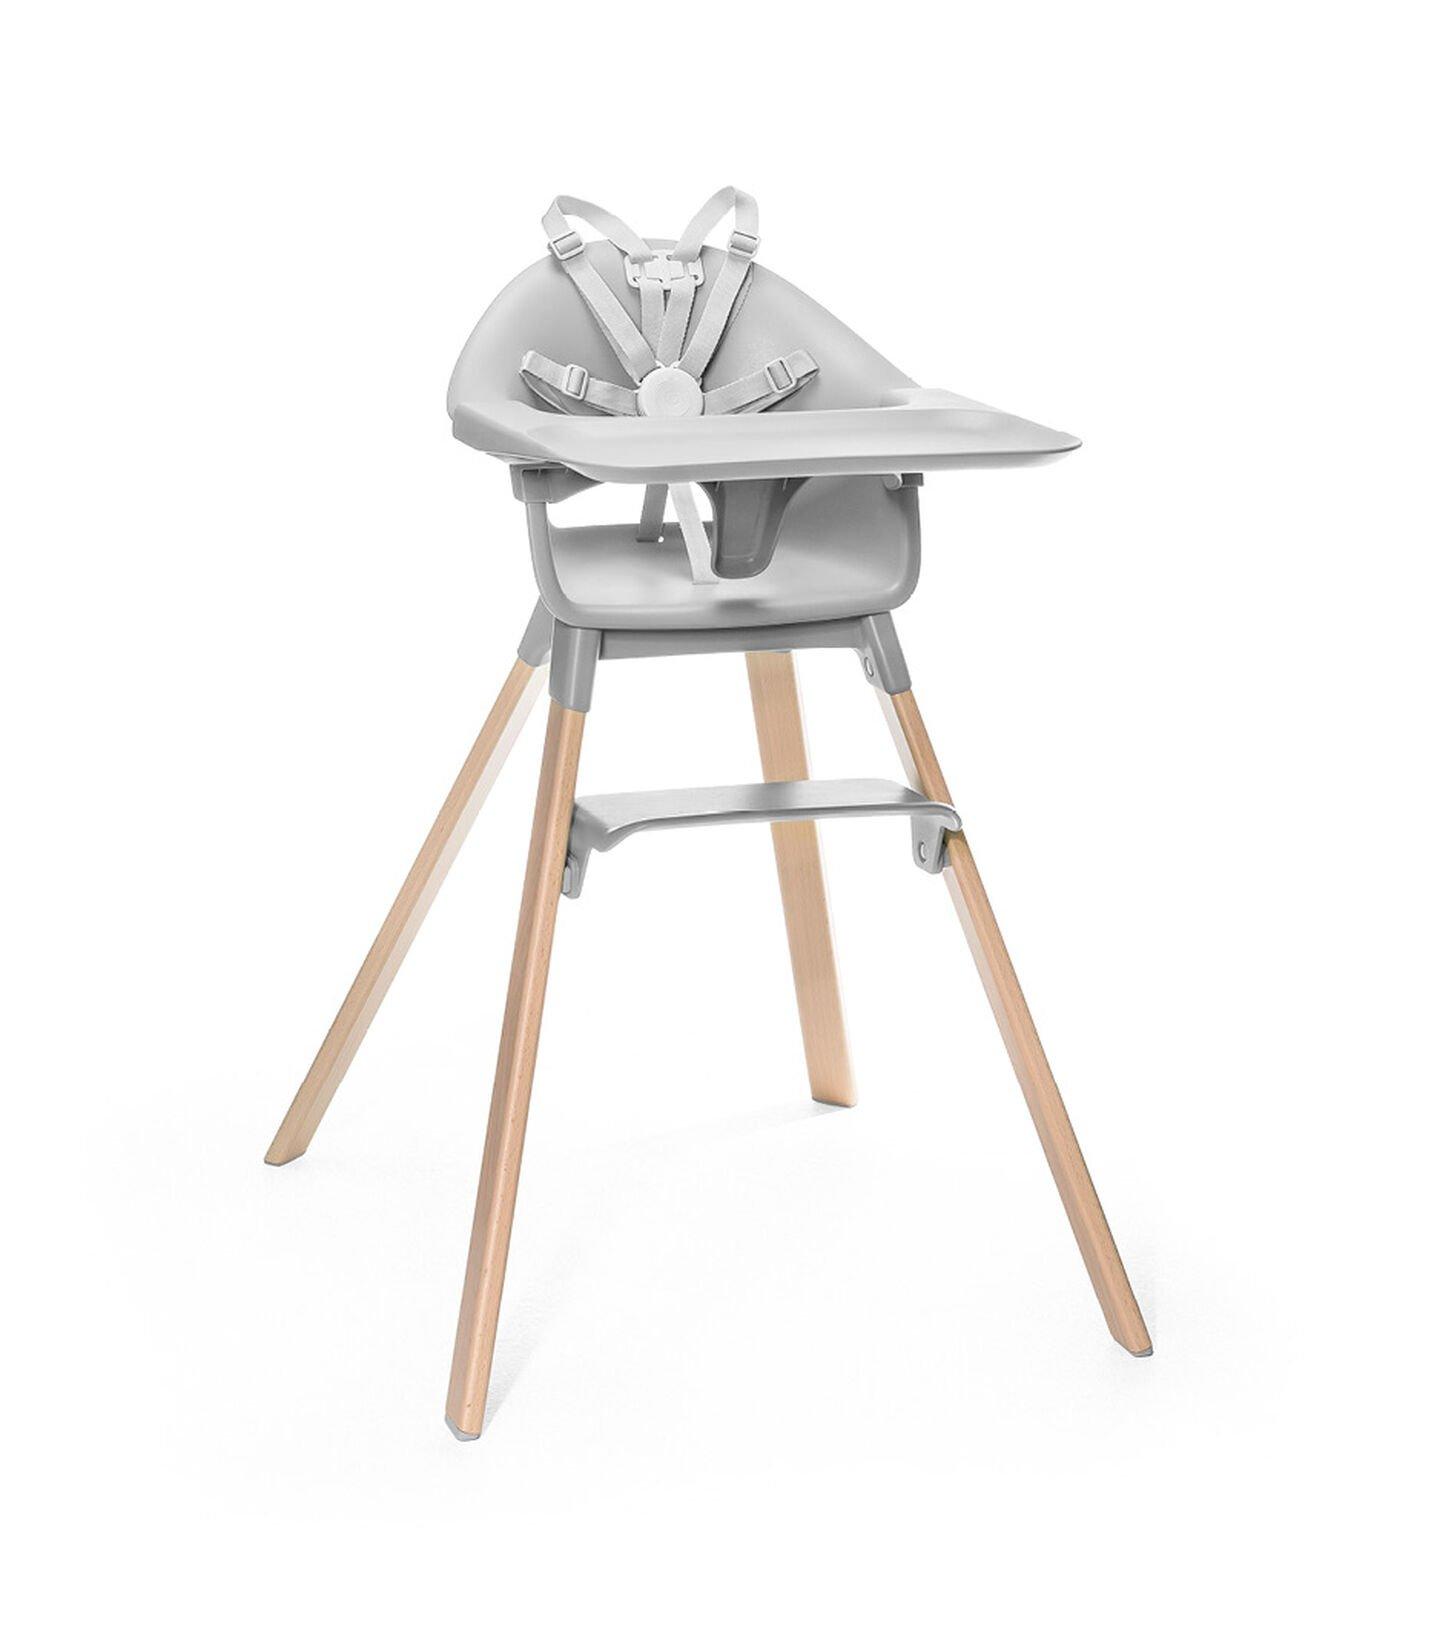 Stokke® Clikk™ High Chair Soft Grey, Облачно-серый, mainview view 2